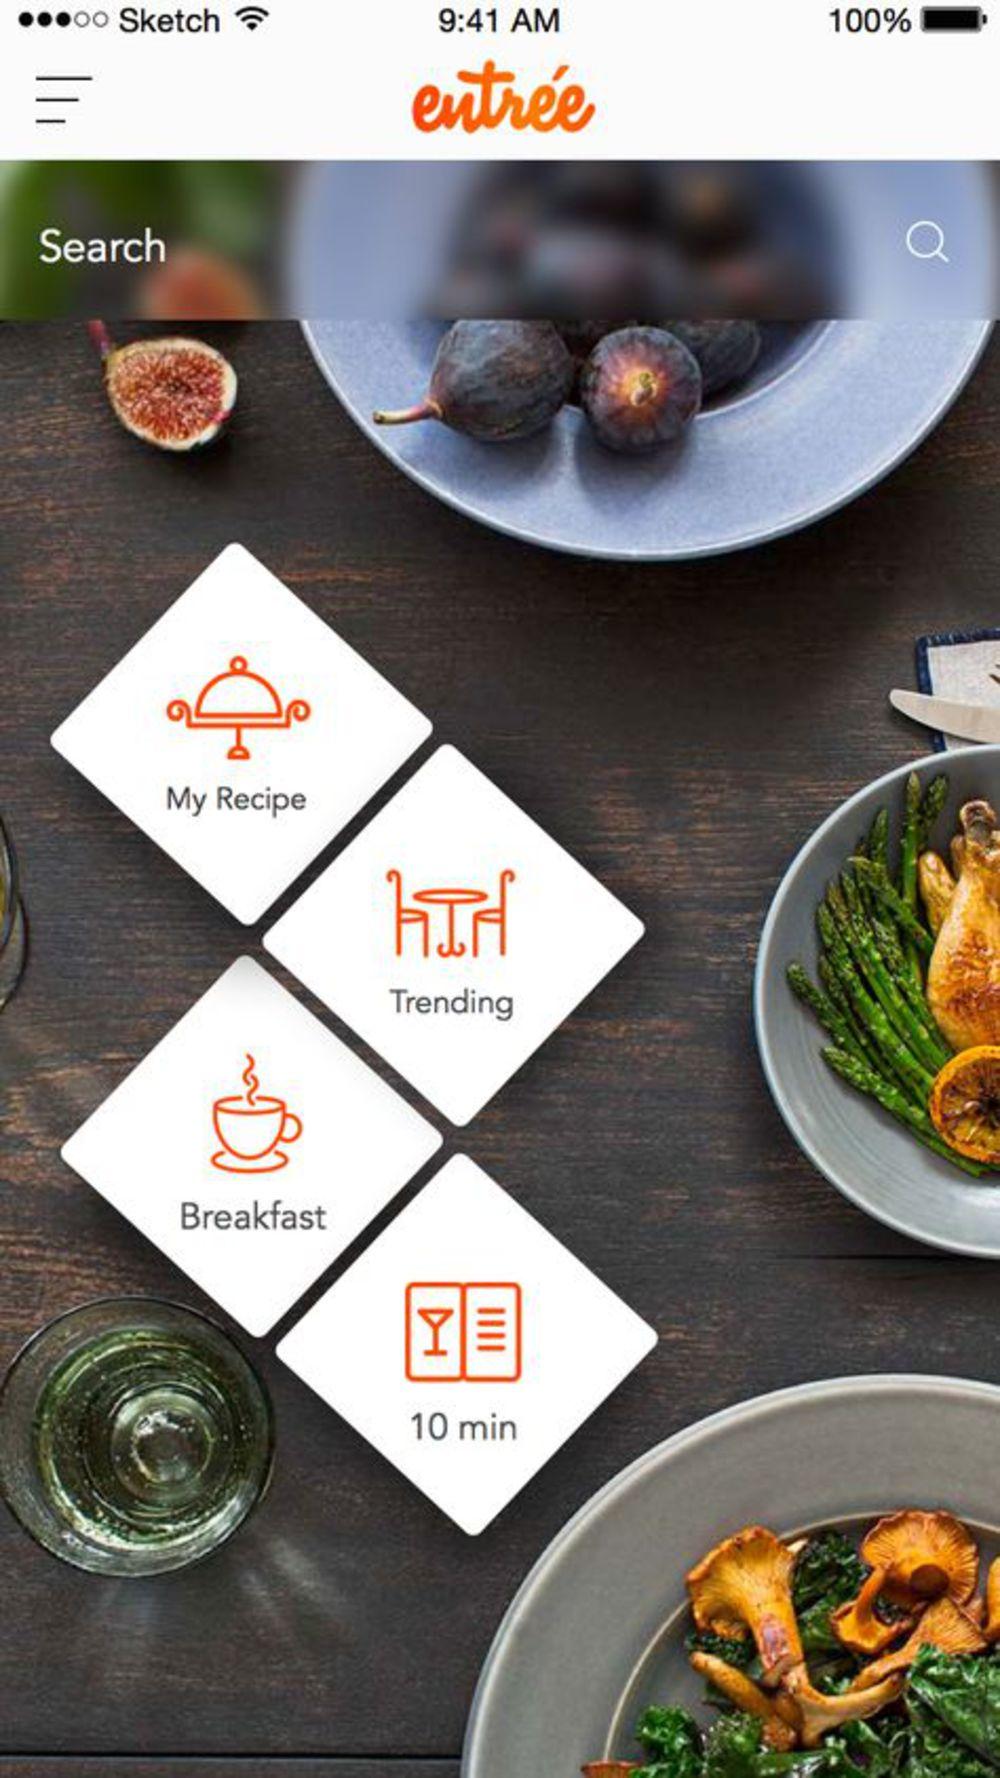 FLAT UI DESIGN on Pinterest | Flat Ui, Flat Design and Mobile Design